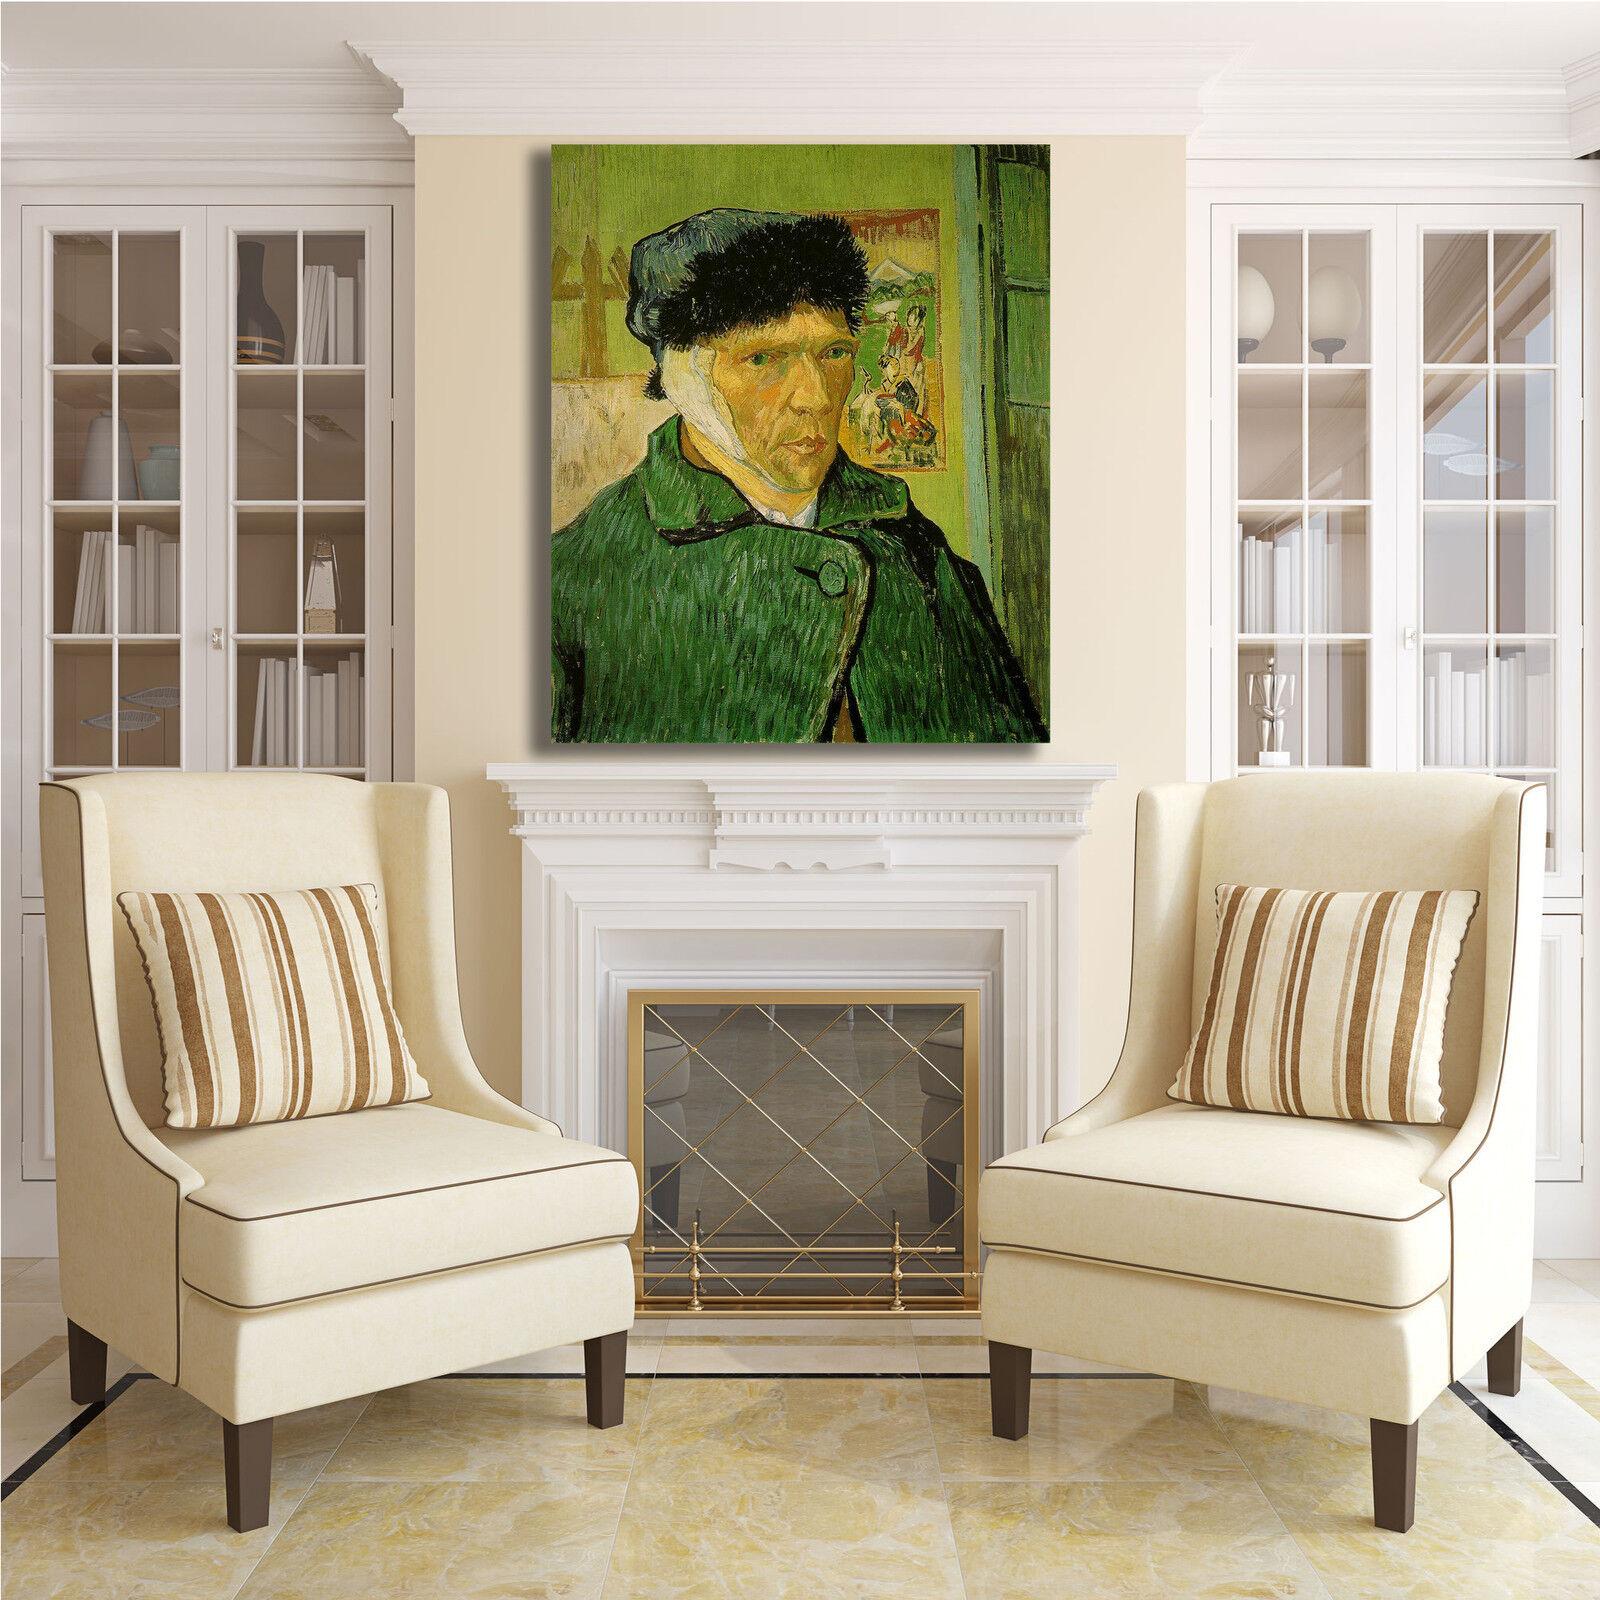 Van Gogh autoritratto con orecchio quadro tela stampa tela quadro dipinto telaio arRouge o casa ed493a